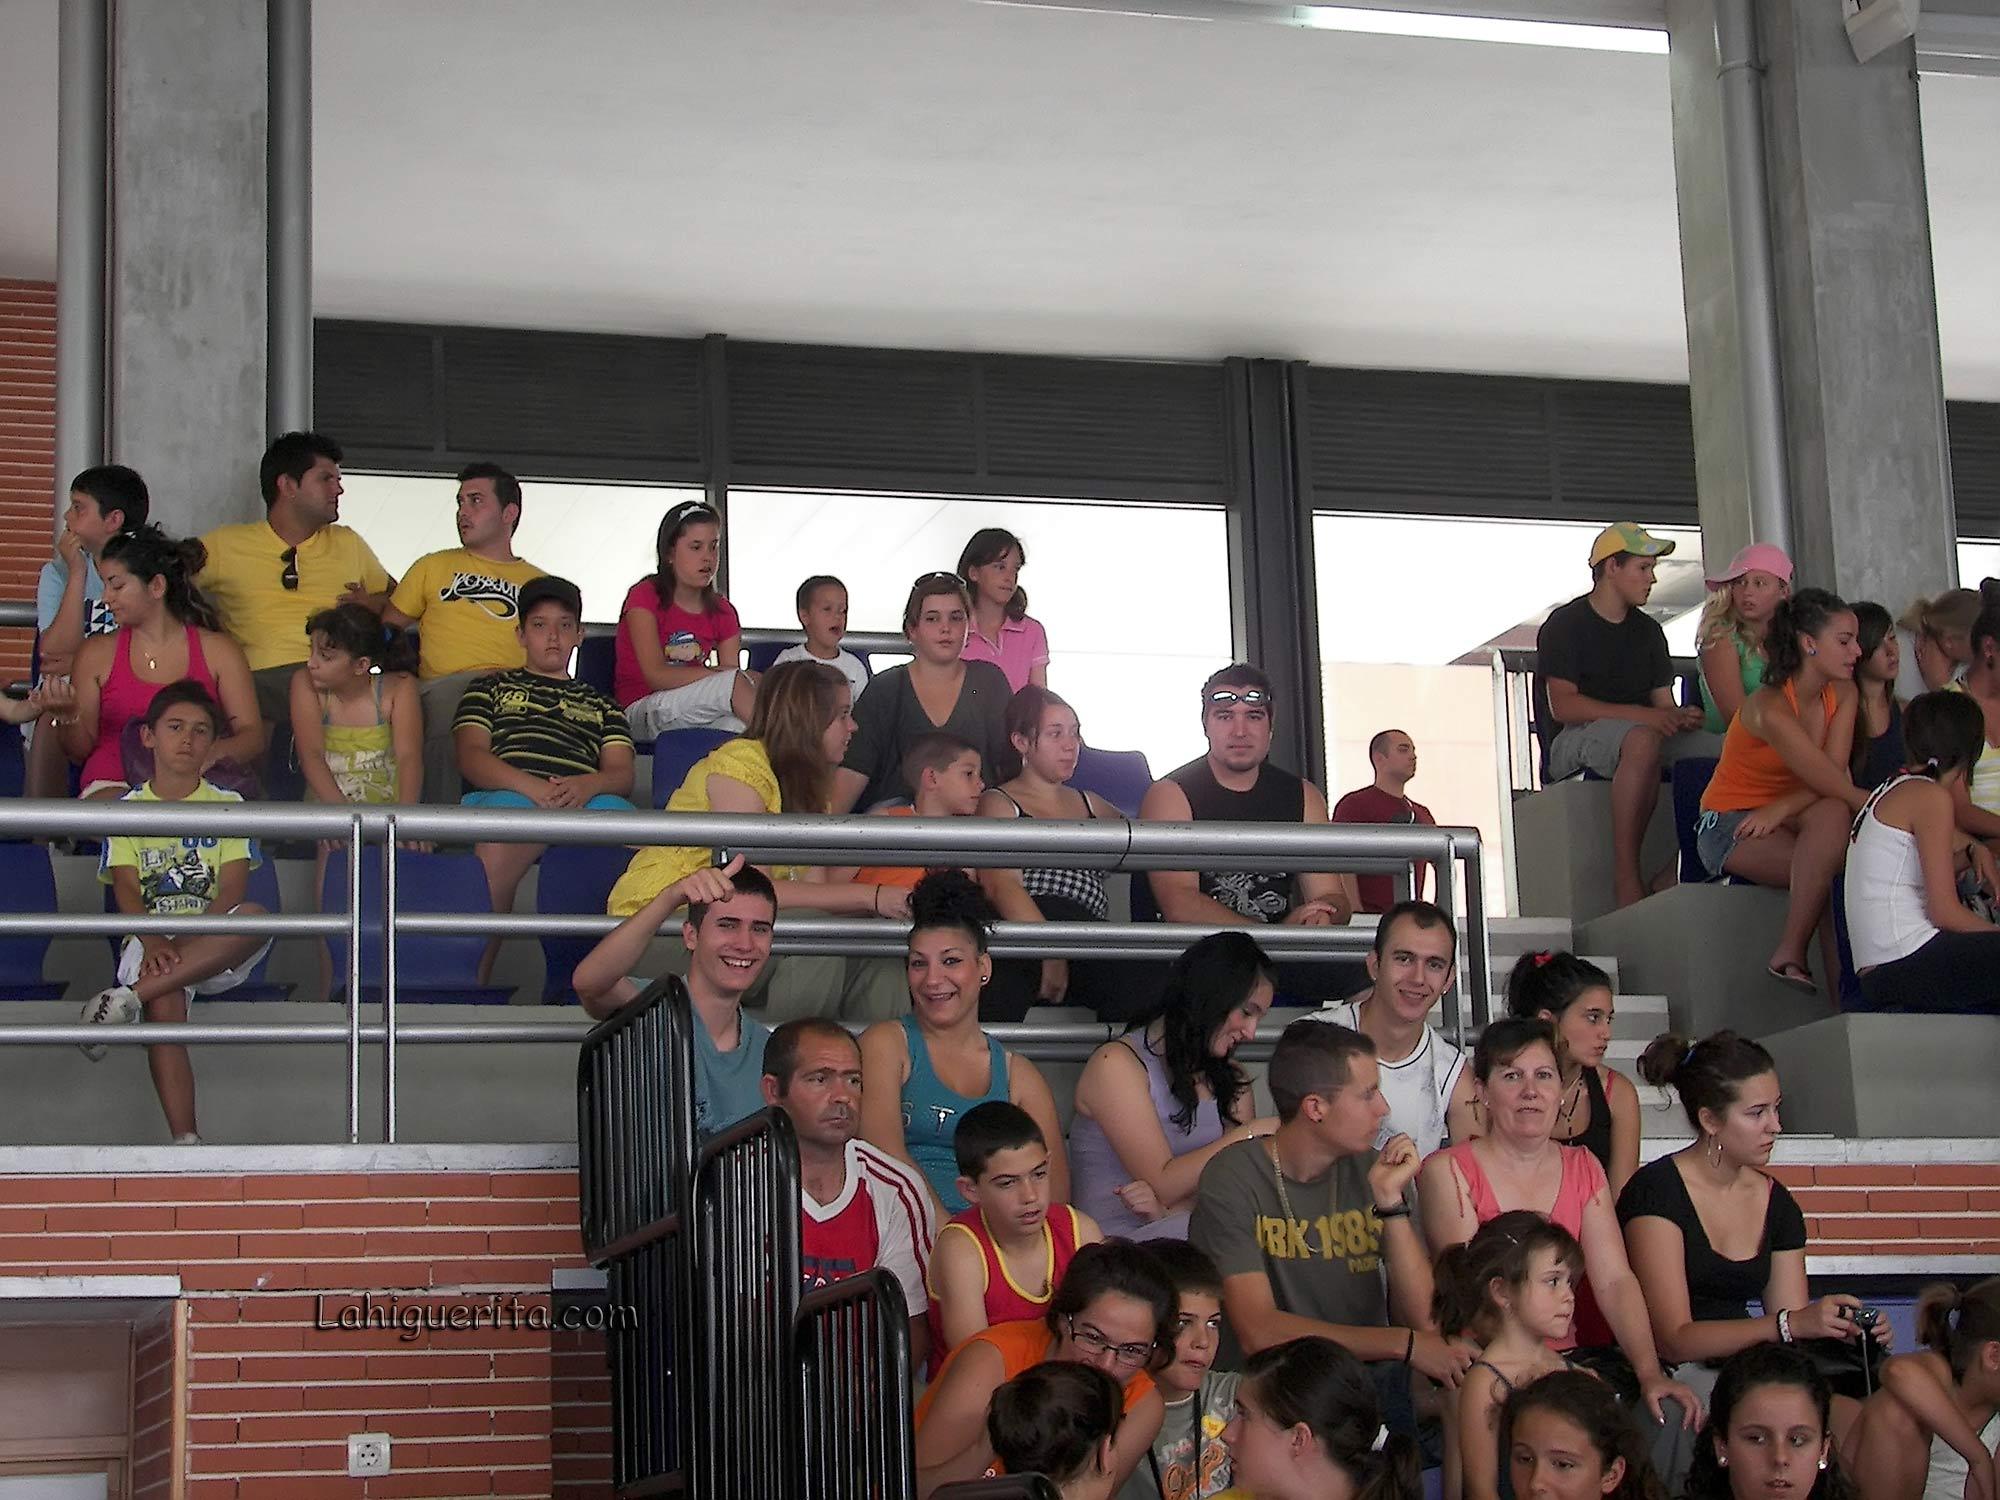 100_3778 fans fisica y quimica – Aguila Roja